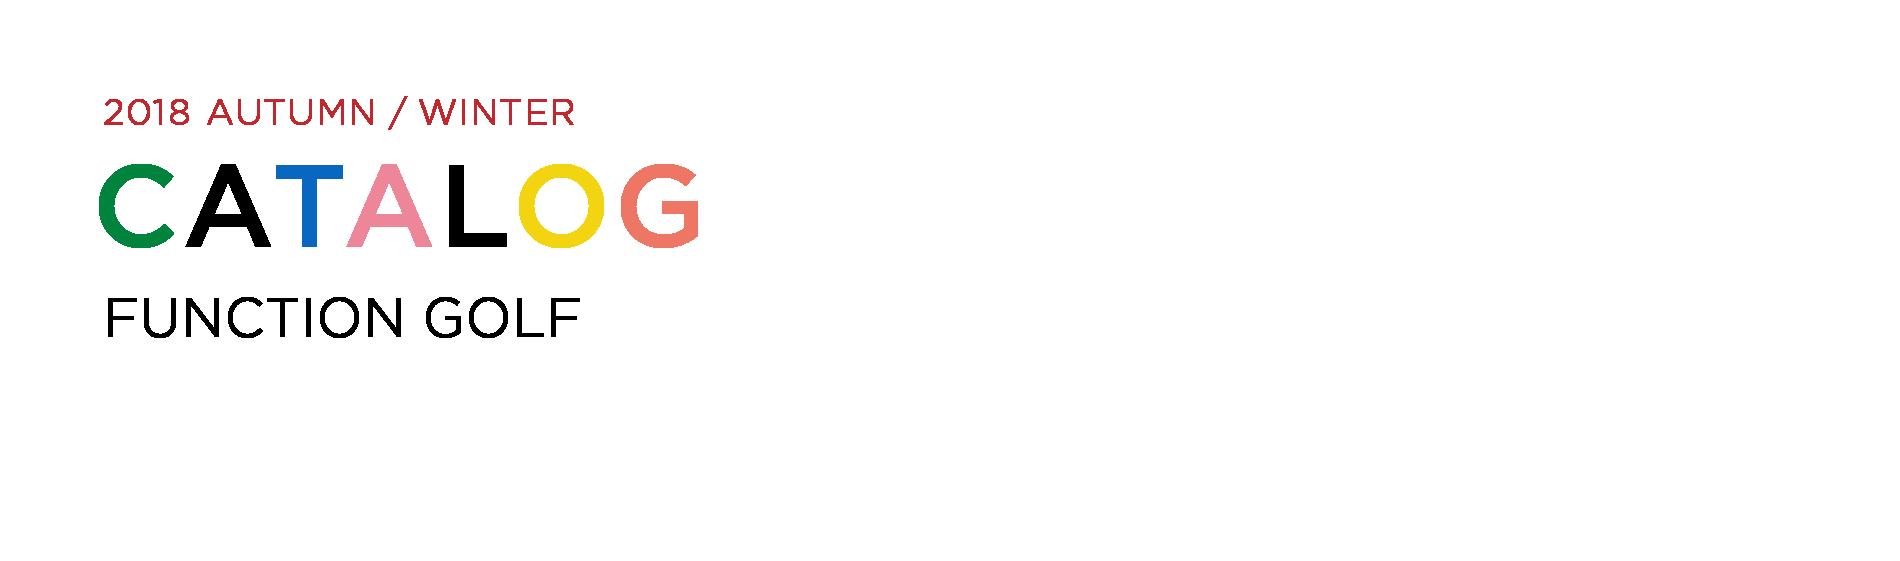 JUN&ROPE' 2018 AUTUMN WINTER CATALOG FUNCTION GOLF